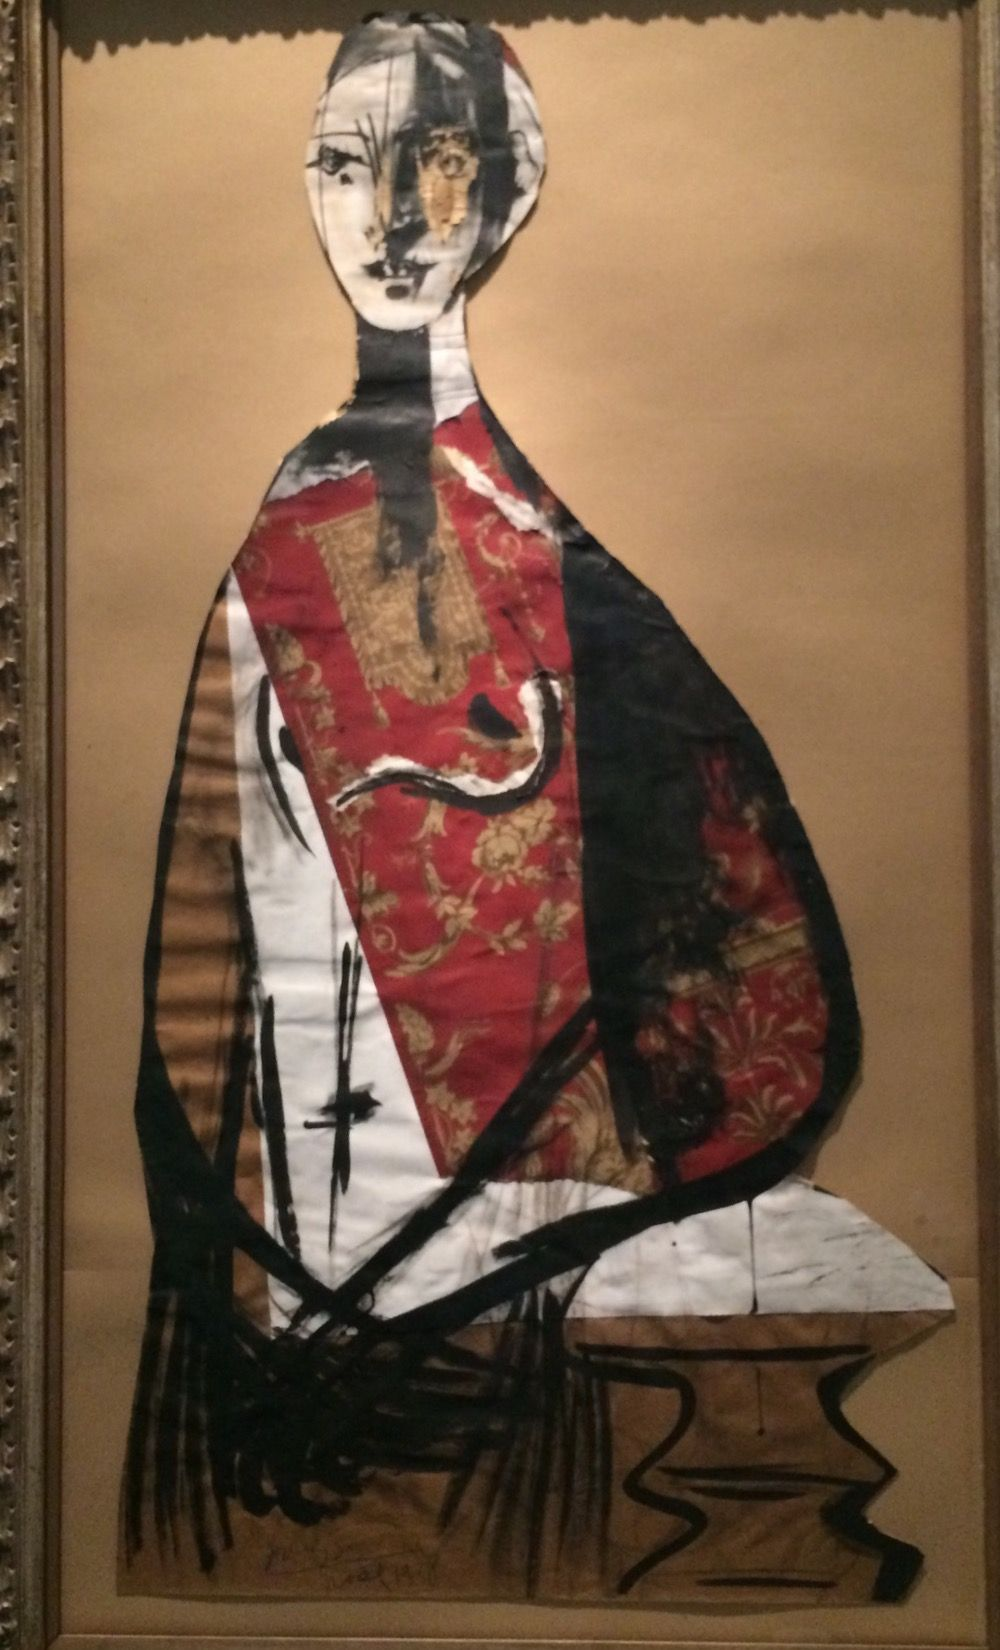 Picasso パブロ・ピカソ, ピカソのアート, ピカソの絵画, 女性の絵